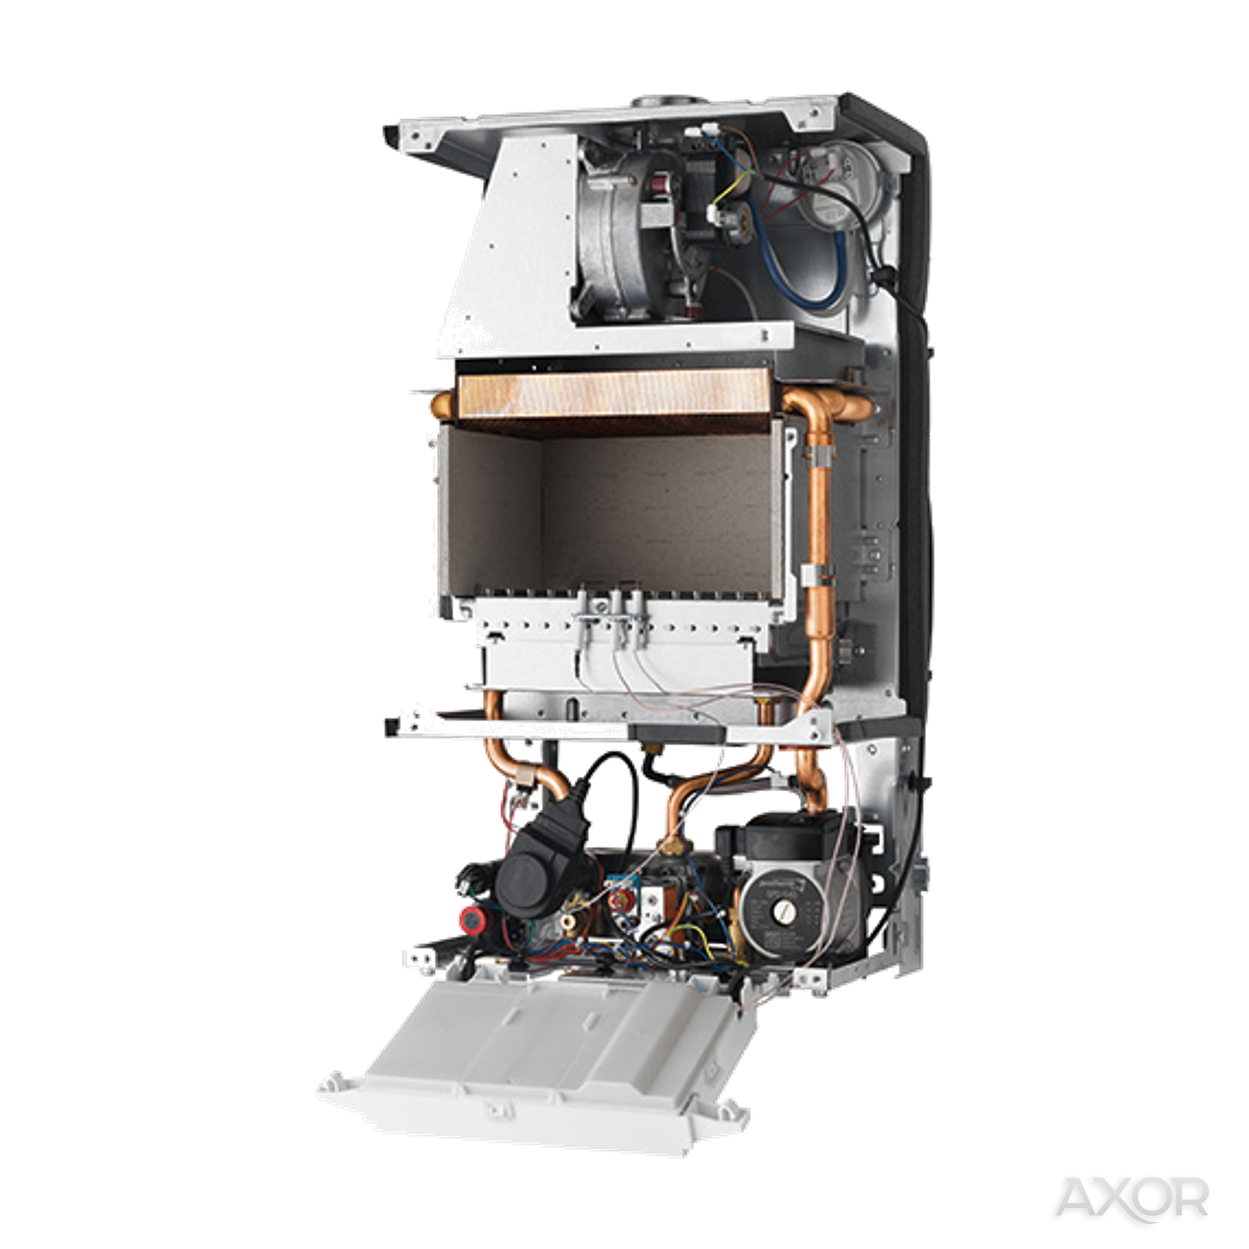 Запчасти для протерм гепард 23мтv теплообменник цена теплообменник подключение схема